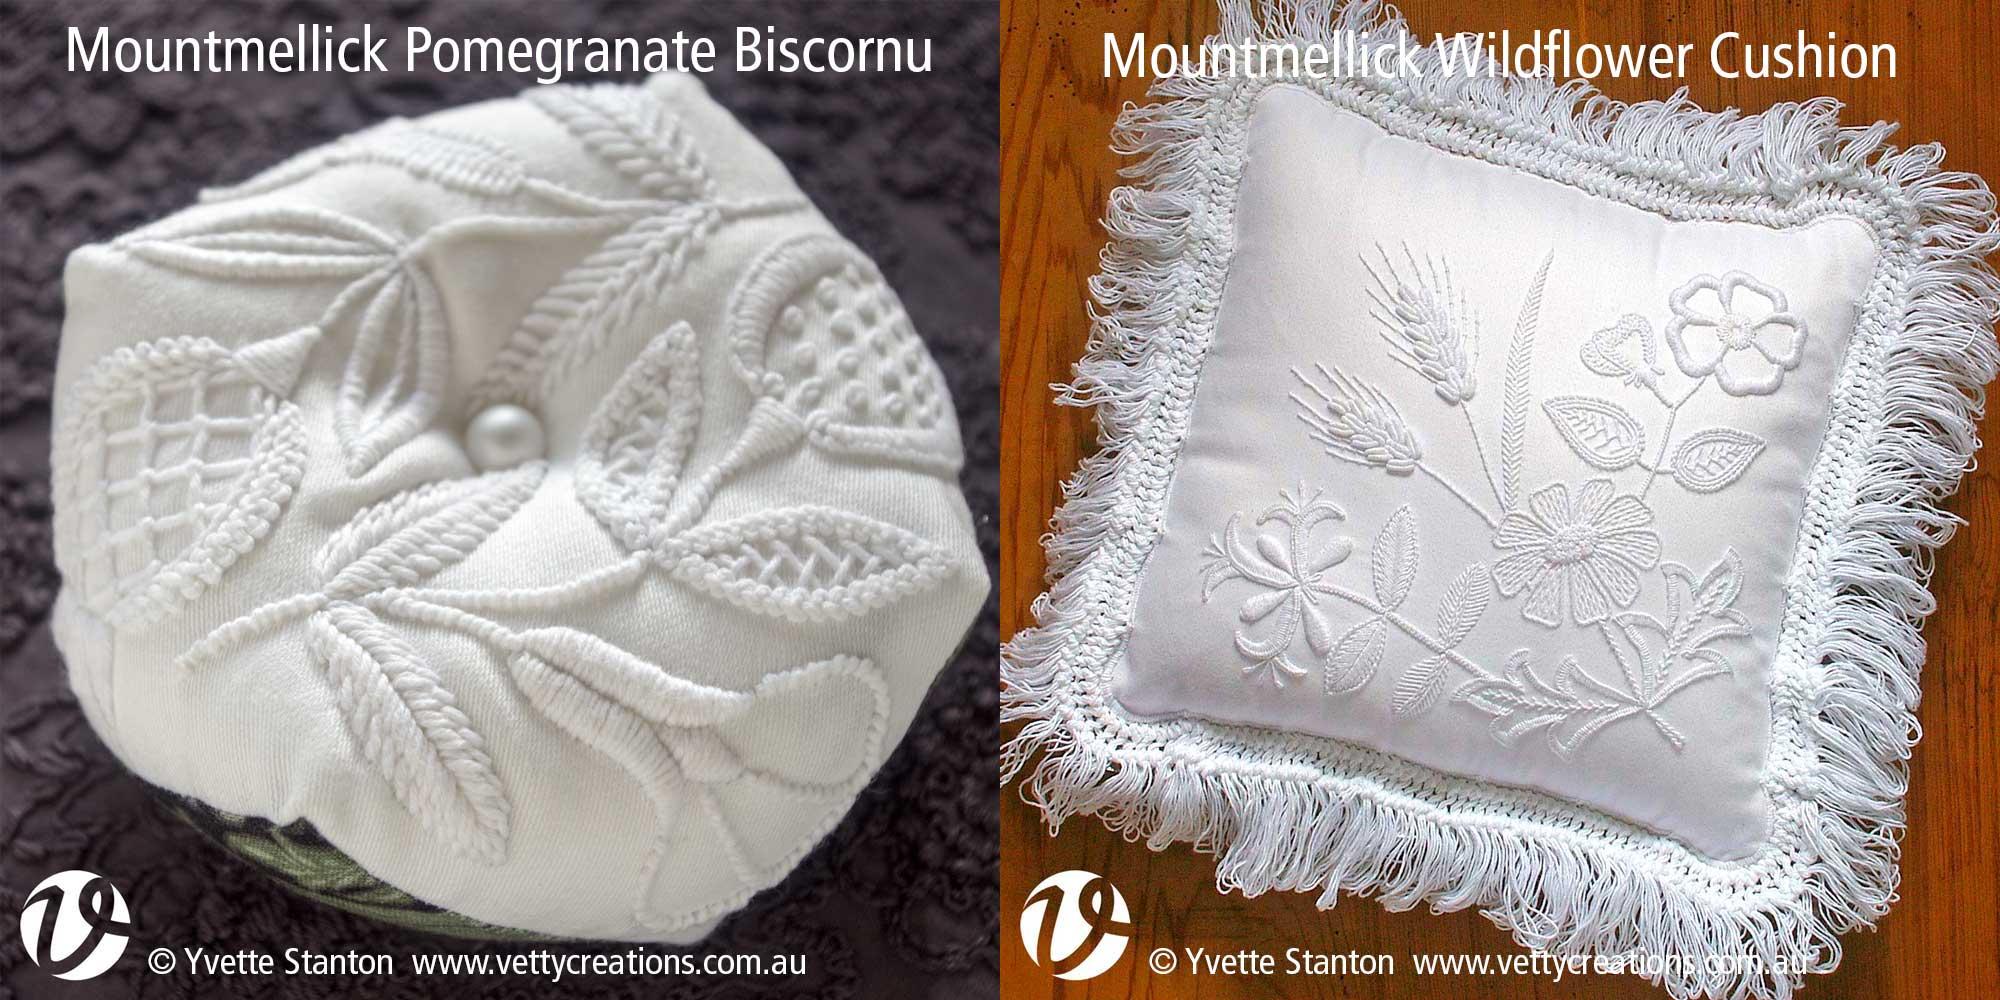 Mountmellick embroidery workshop